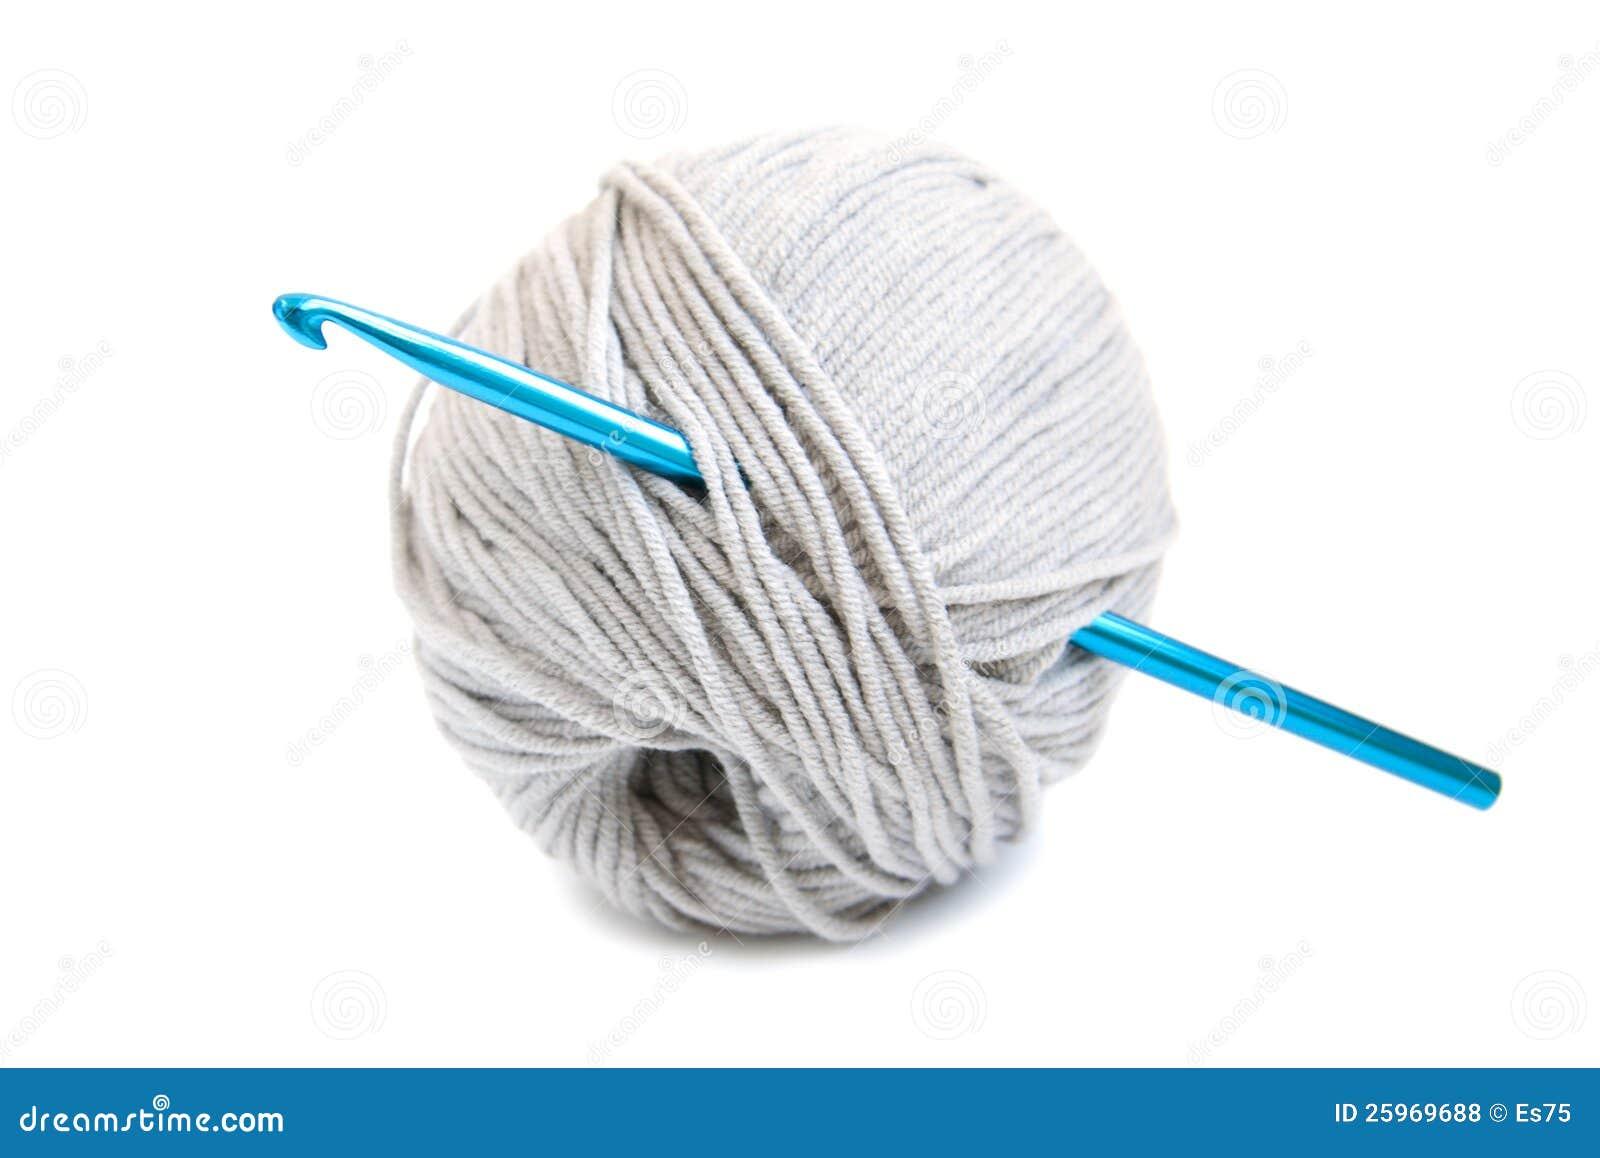 Crochet Hook And Yarn Stock Photo Image Of Hook Wool 25969688